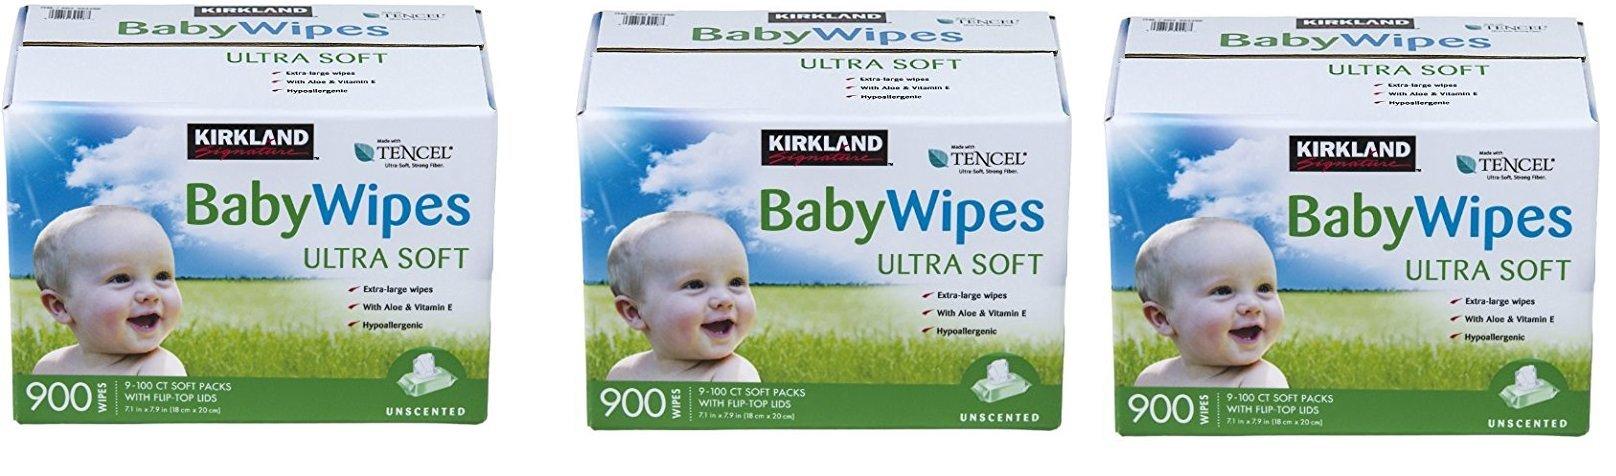 Kirkland Signature Baby Wipes, zKixFp, 3 Boxes of 900 Wipes by Kirkland Signature (Image #1)